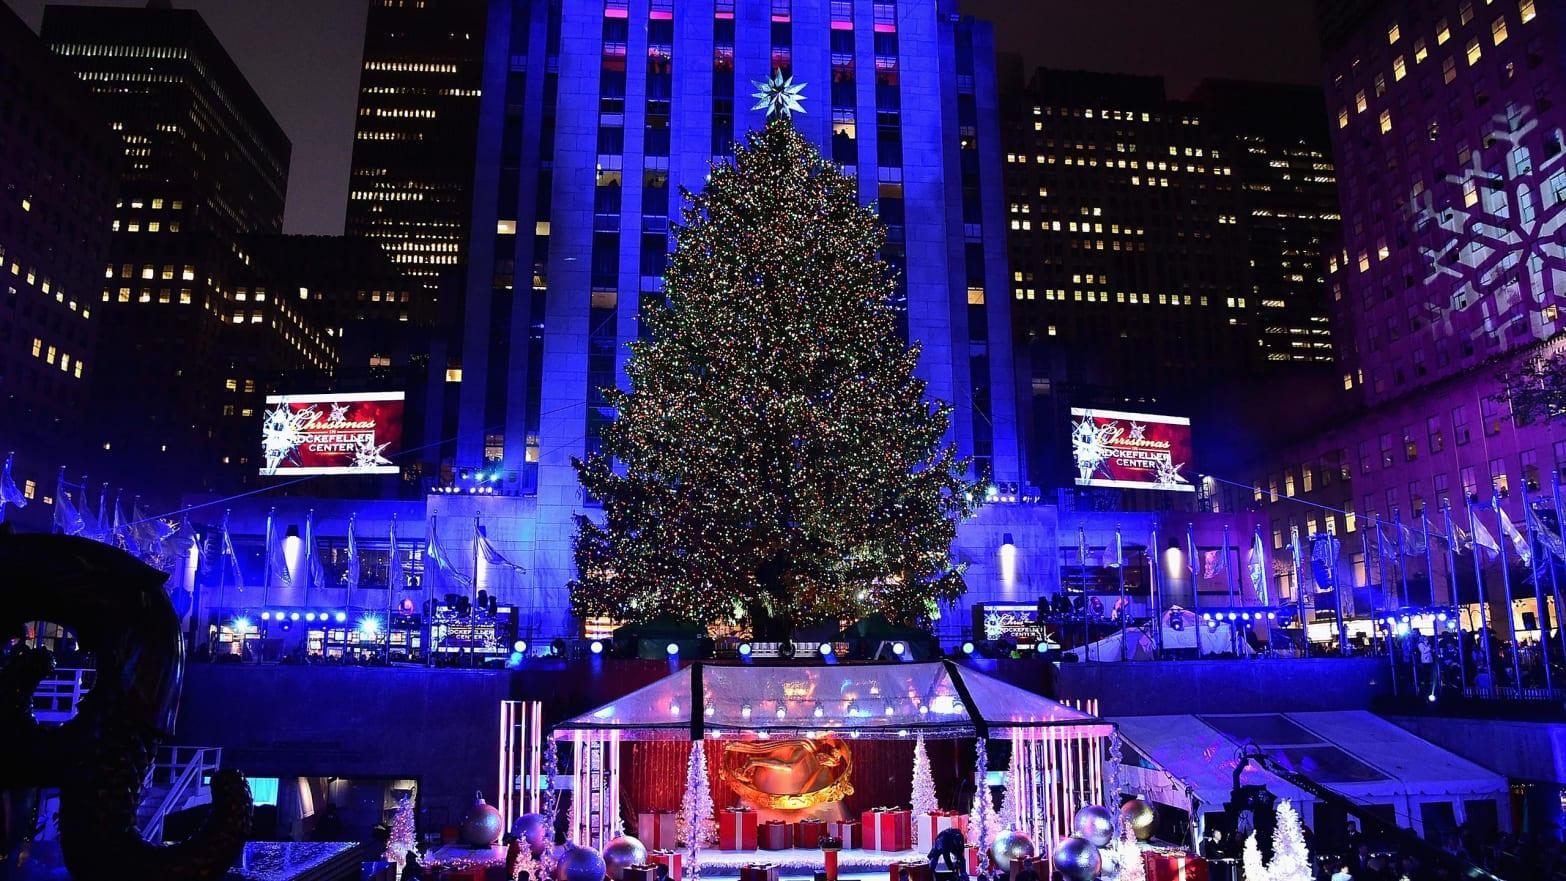 2017 Rockefeller Center Christmas Tree Lighting Ceremony: How to Watch, Live Stream